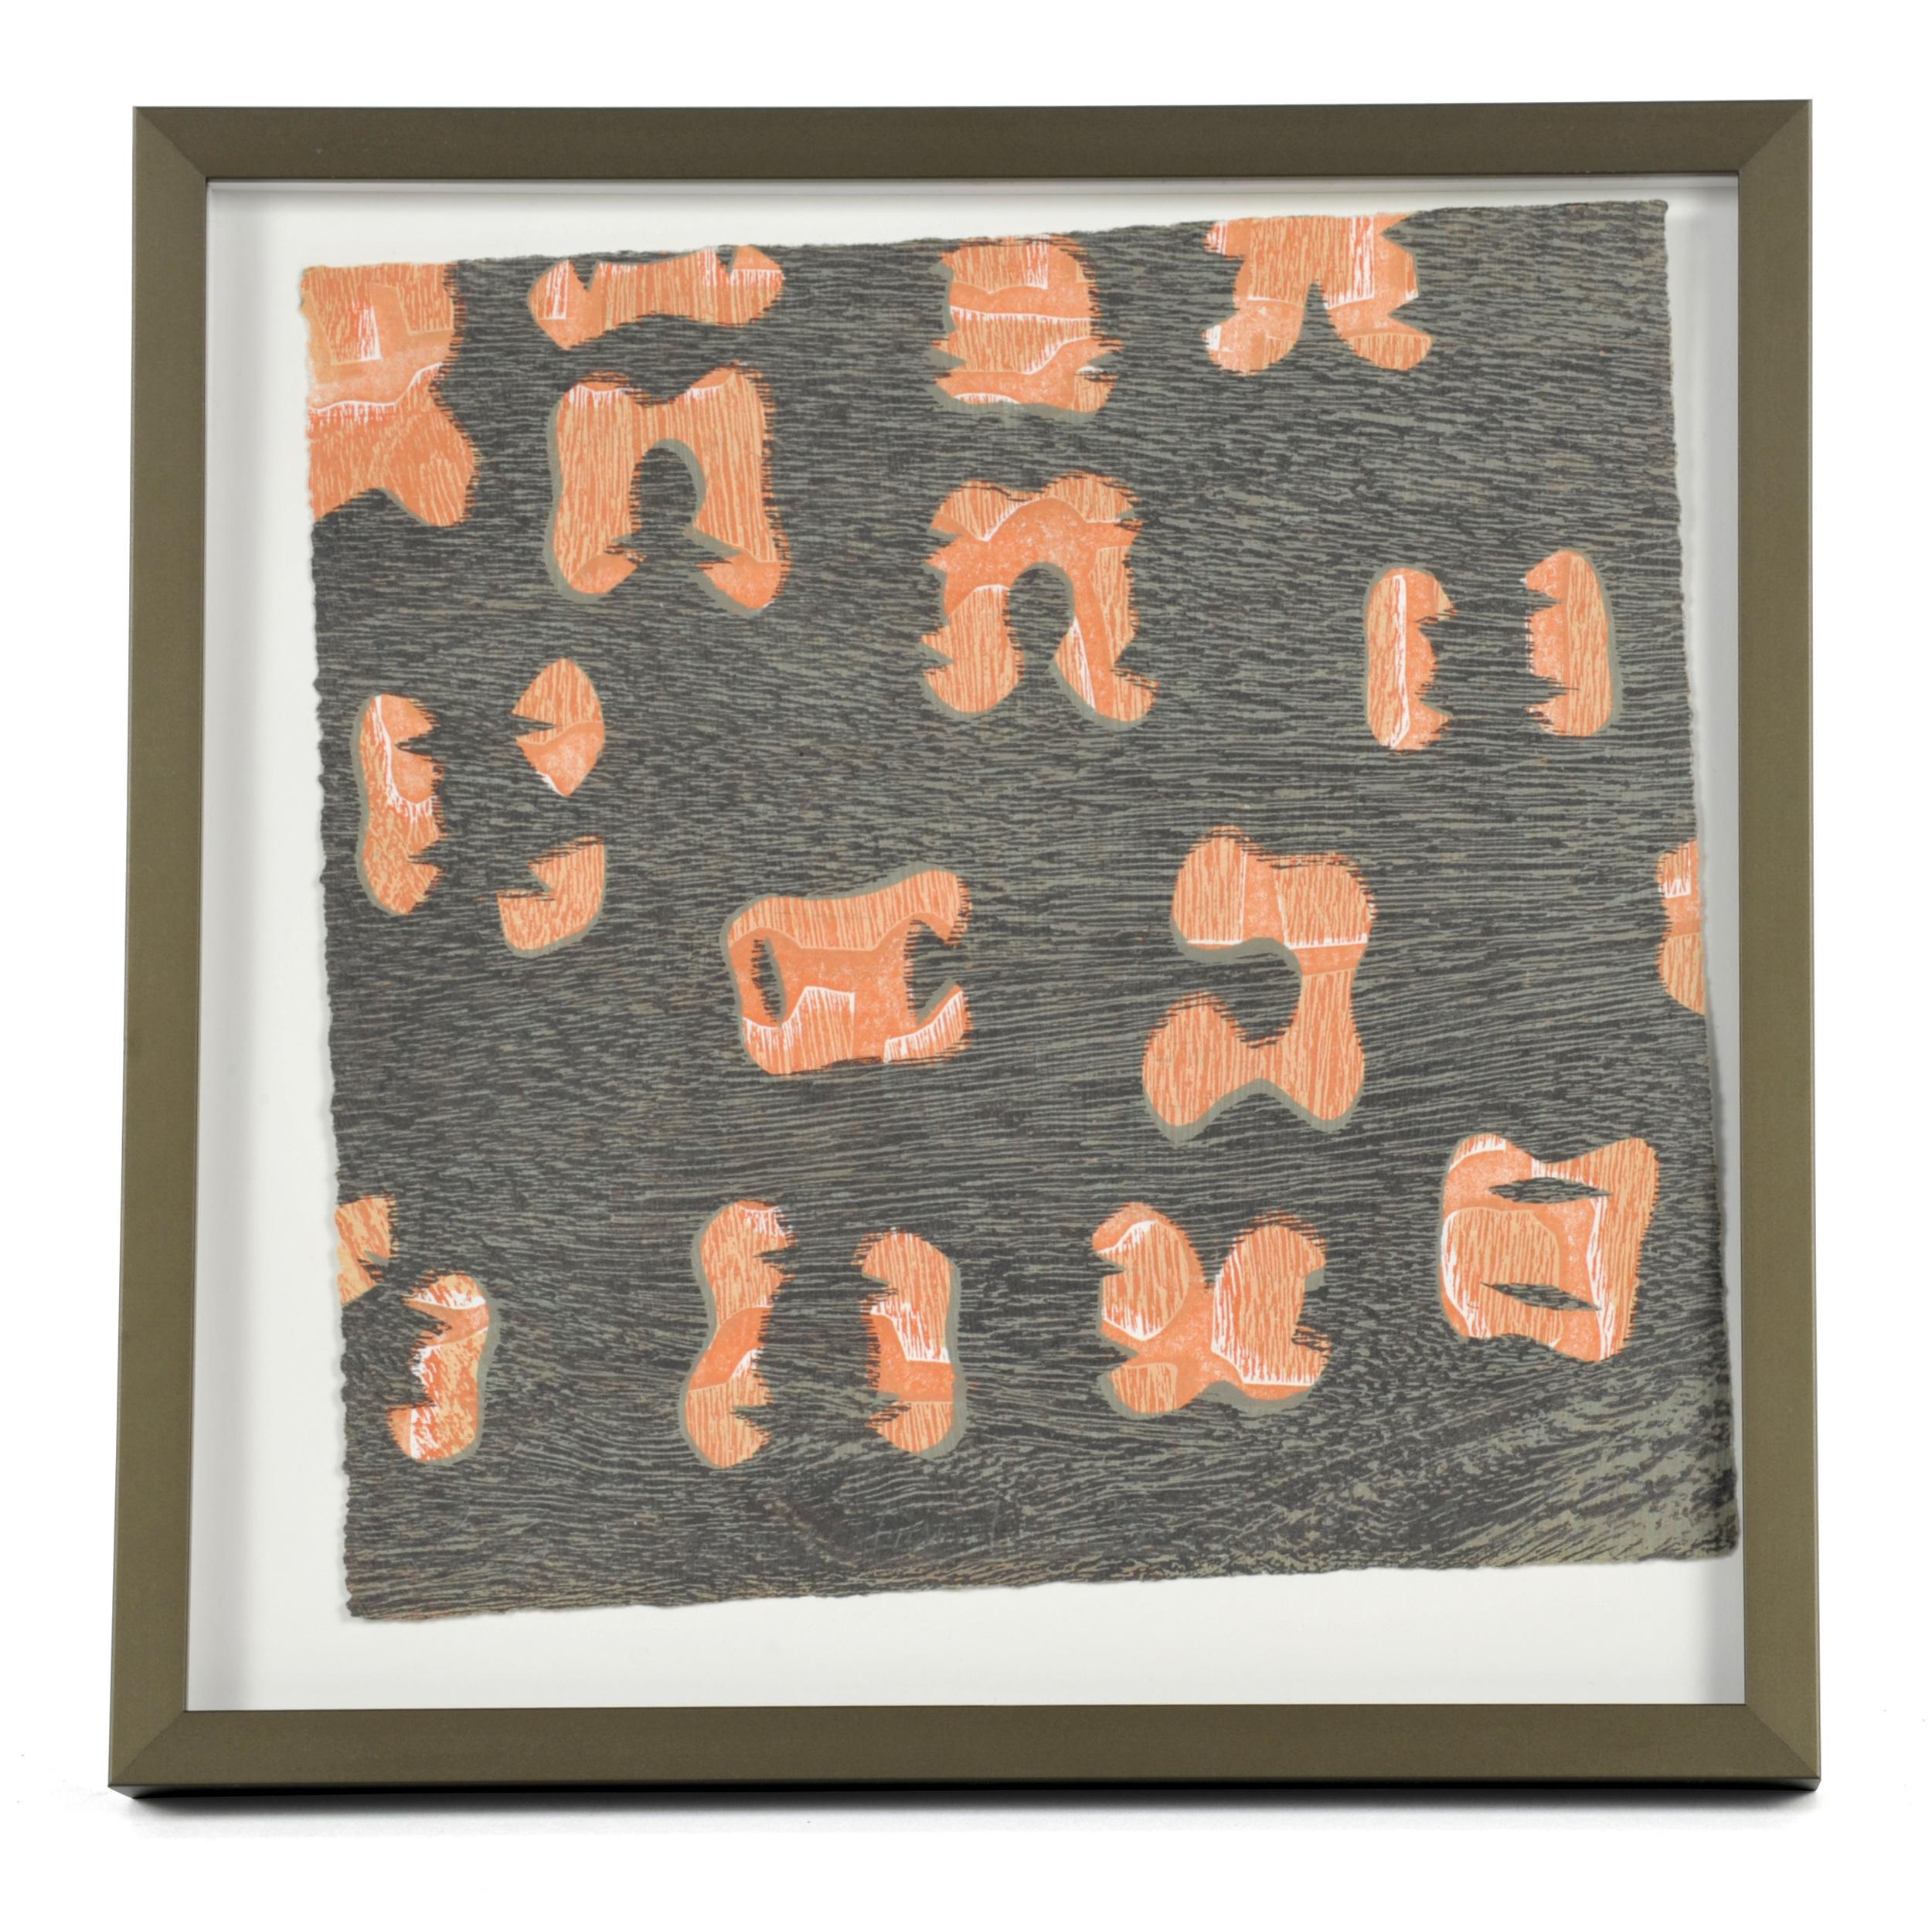 Carmi Weingrod     Lost in Conversation , 2012  Woodblock and stencil monoprint